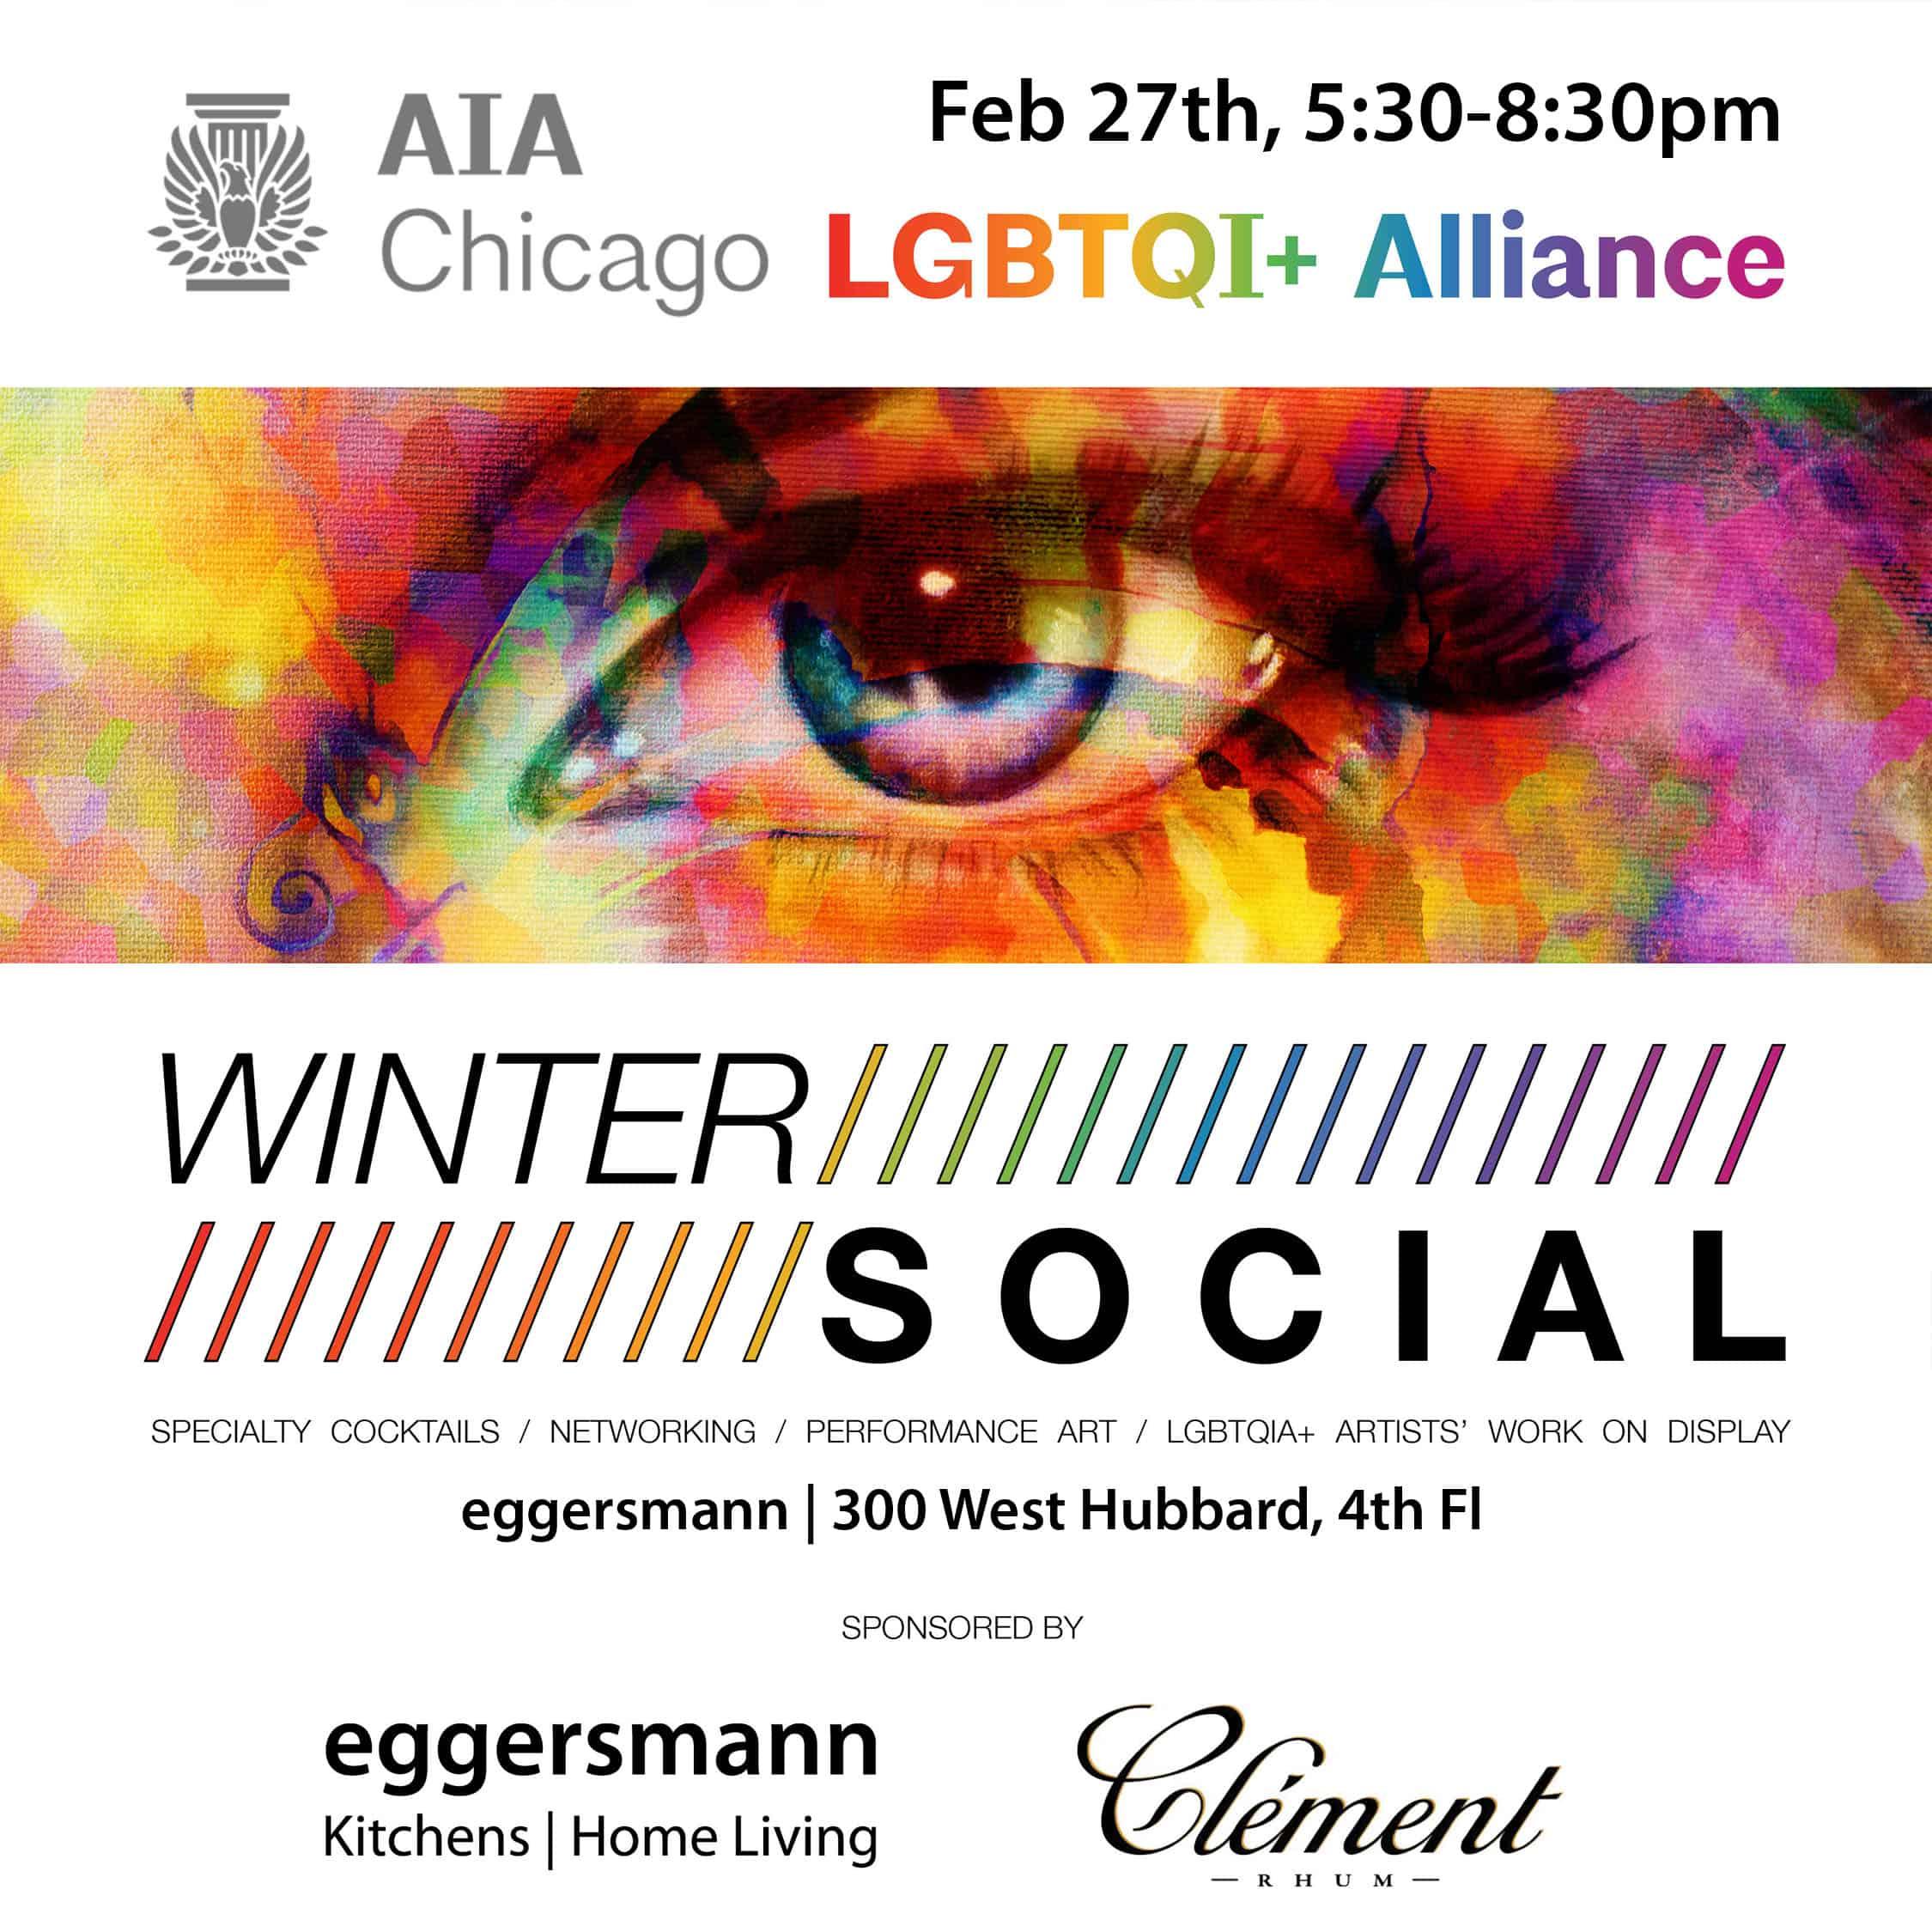 AIA CHICAGO LBGTQI WINTER SOCIAL